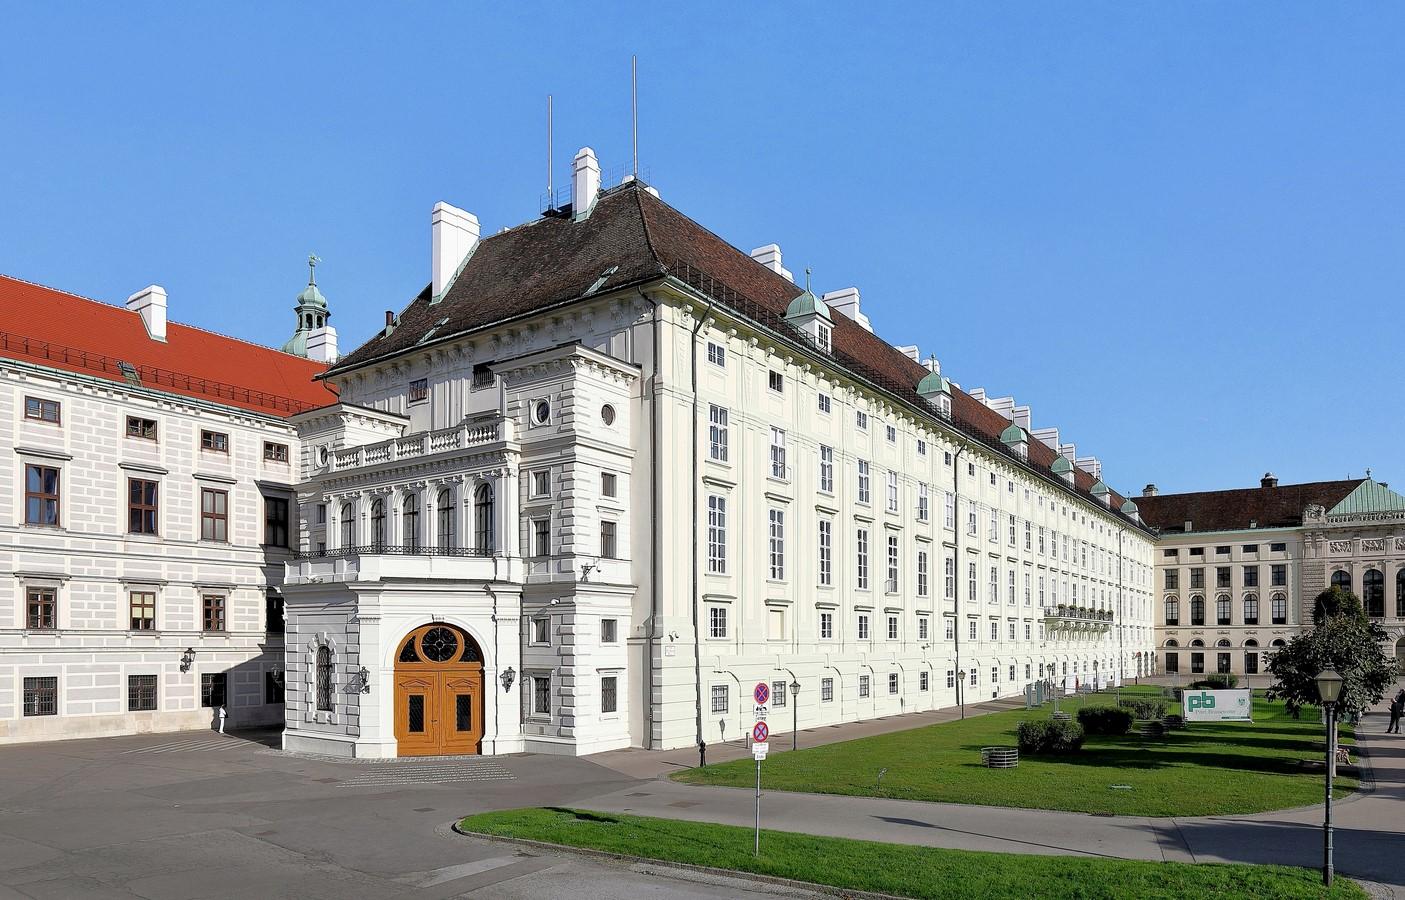 The Imperial Palace of Hofburg, Michaelerkuppel, 1010 Wien, Austria - Sheet3